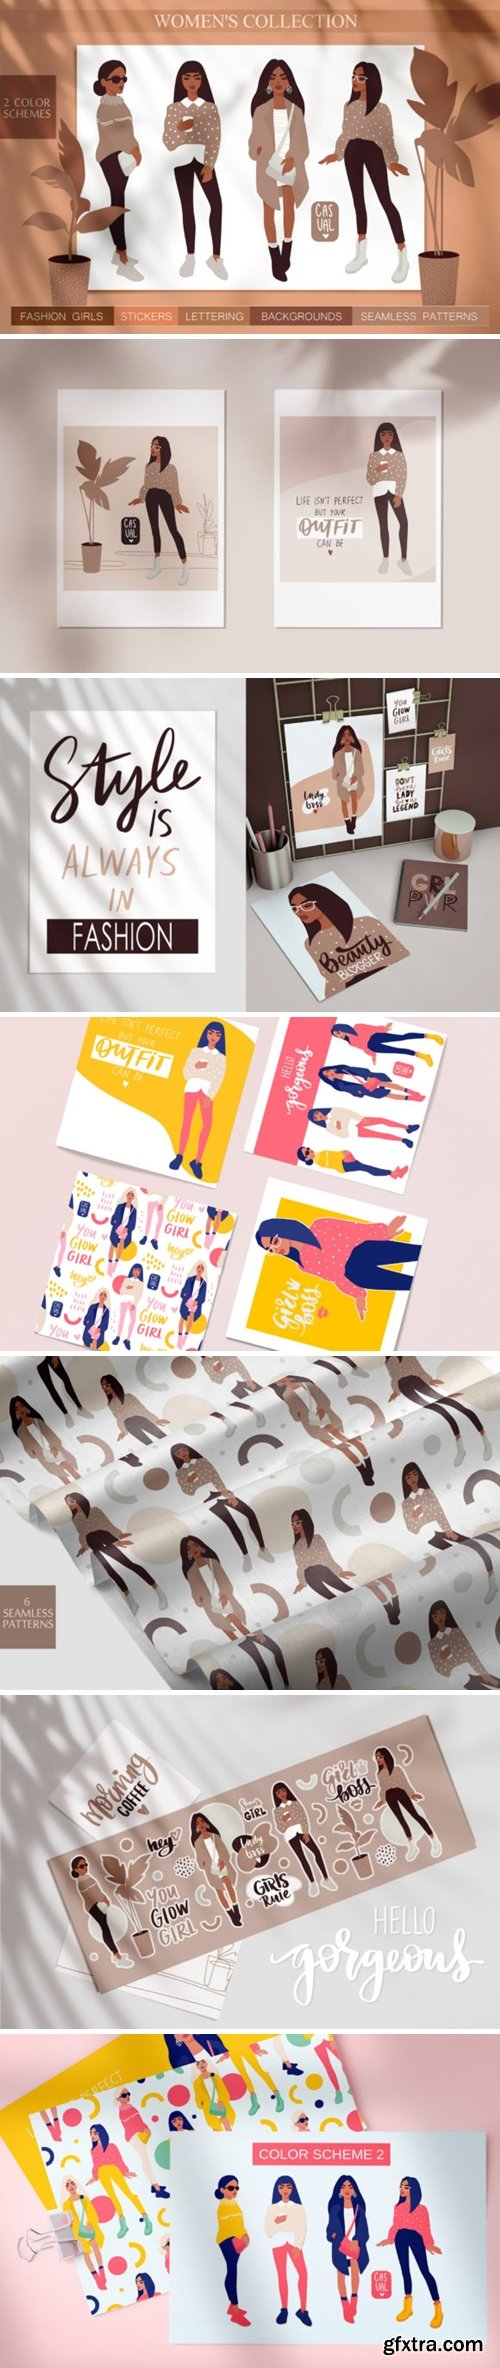 Women, Girls Fashion Illustration 2218965